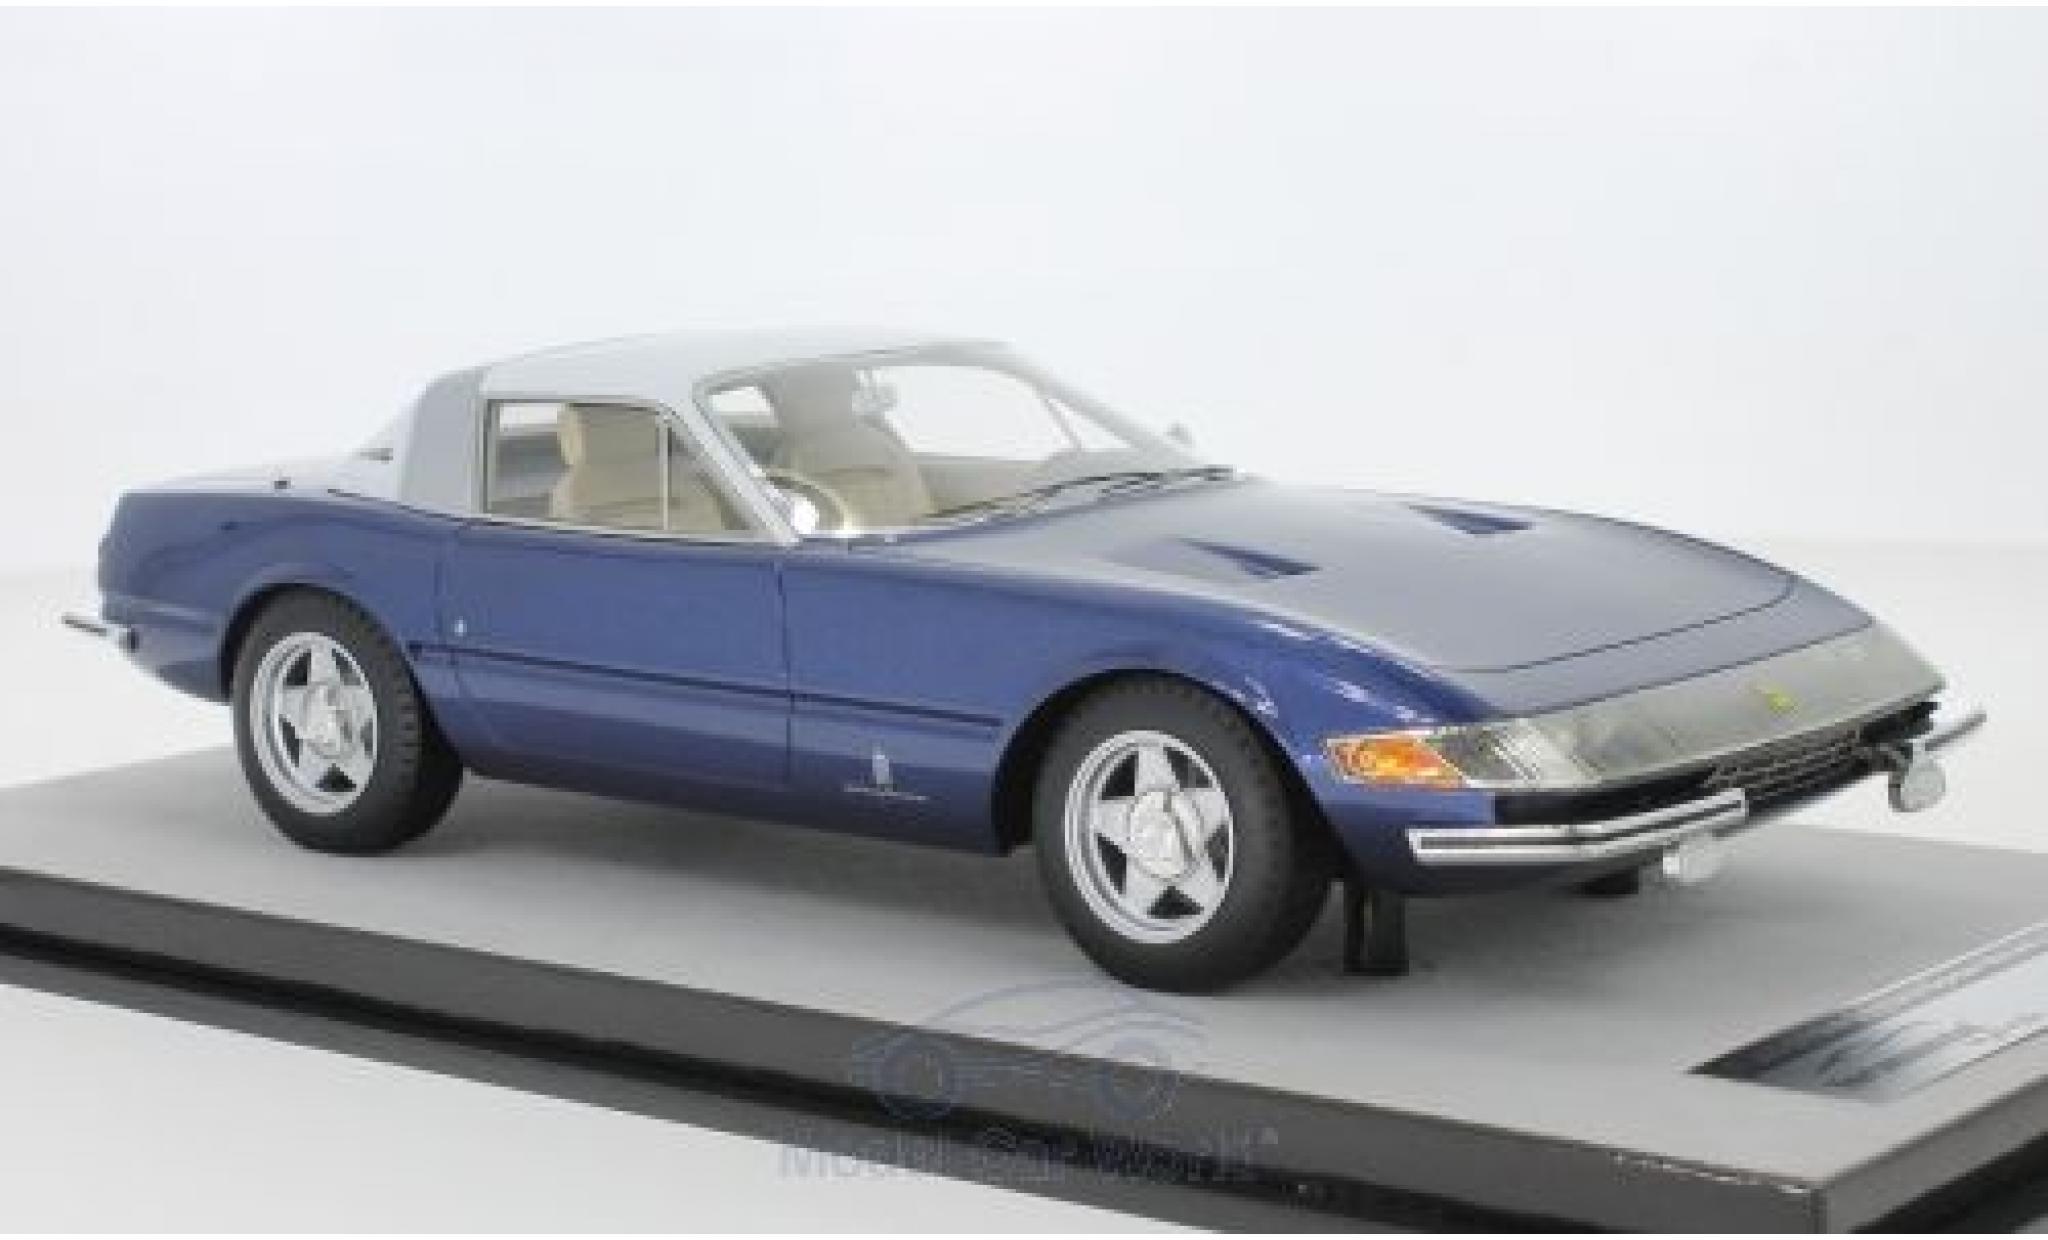 Ferrari 365 1/18 Tecnomodel GTB/4 Daytona Coupe Speciale metallise bleue/blanche 1969